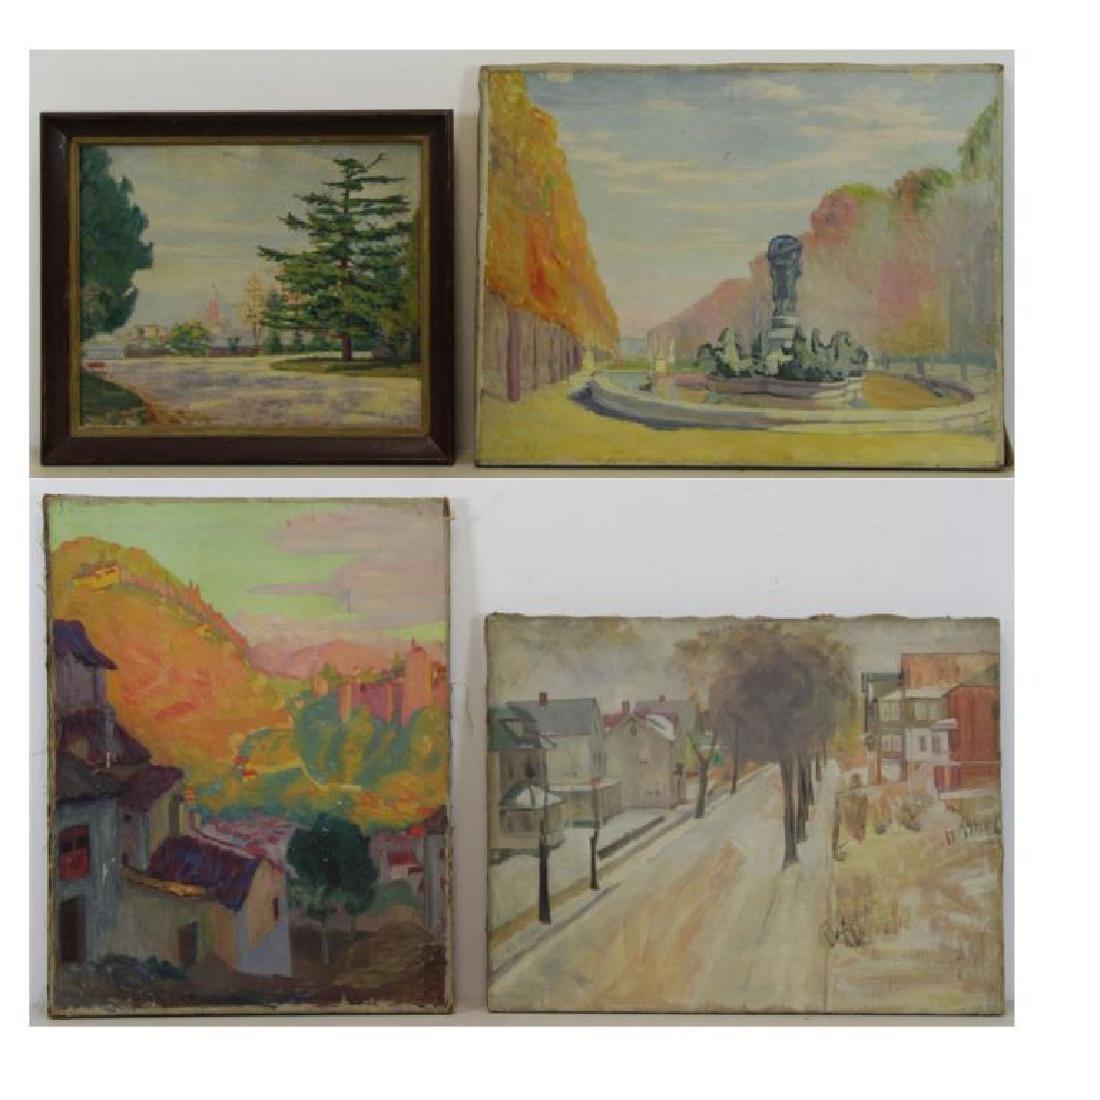 FREDER, Frederick. Four Oil on Canvas Landscapes. - 2